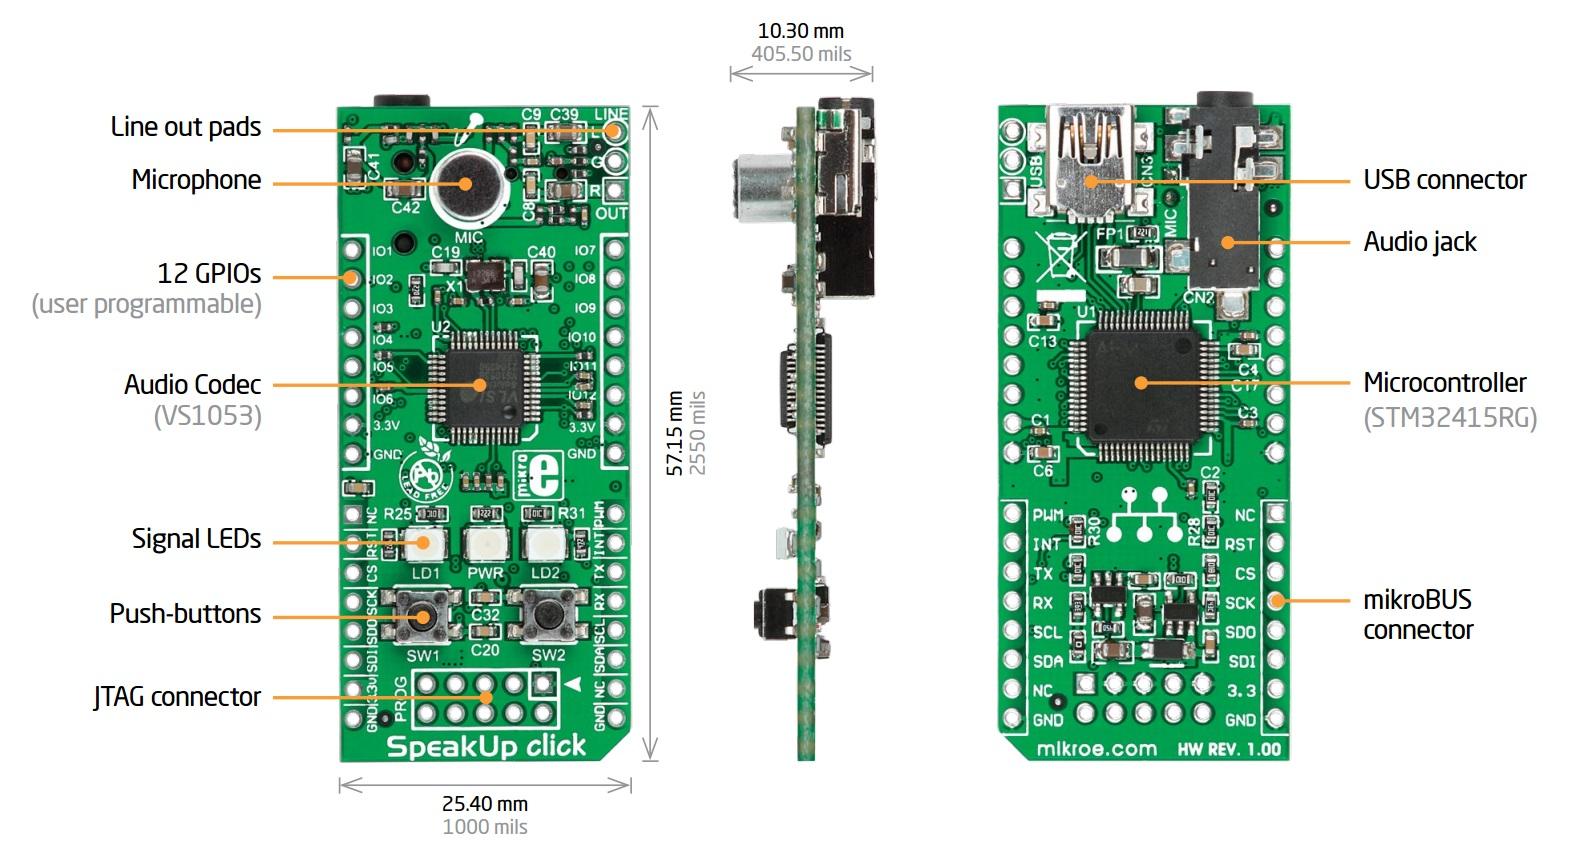 speakup-click-3-hardware-pro